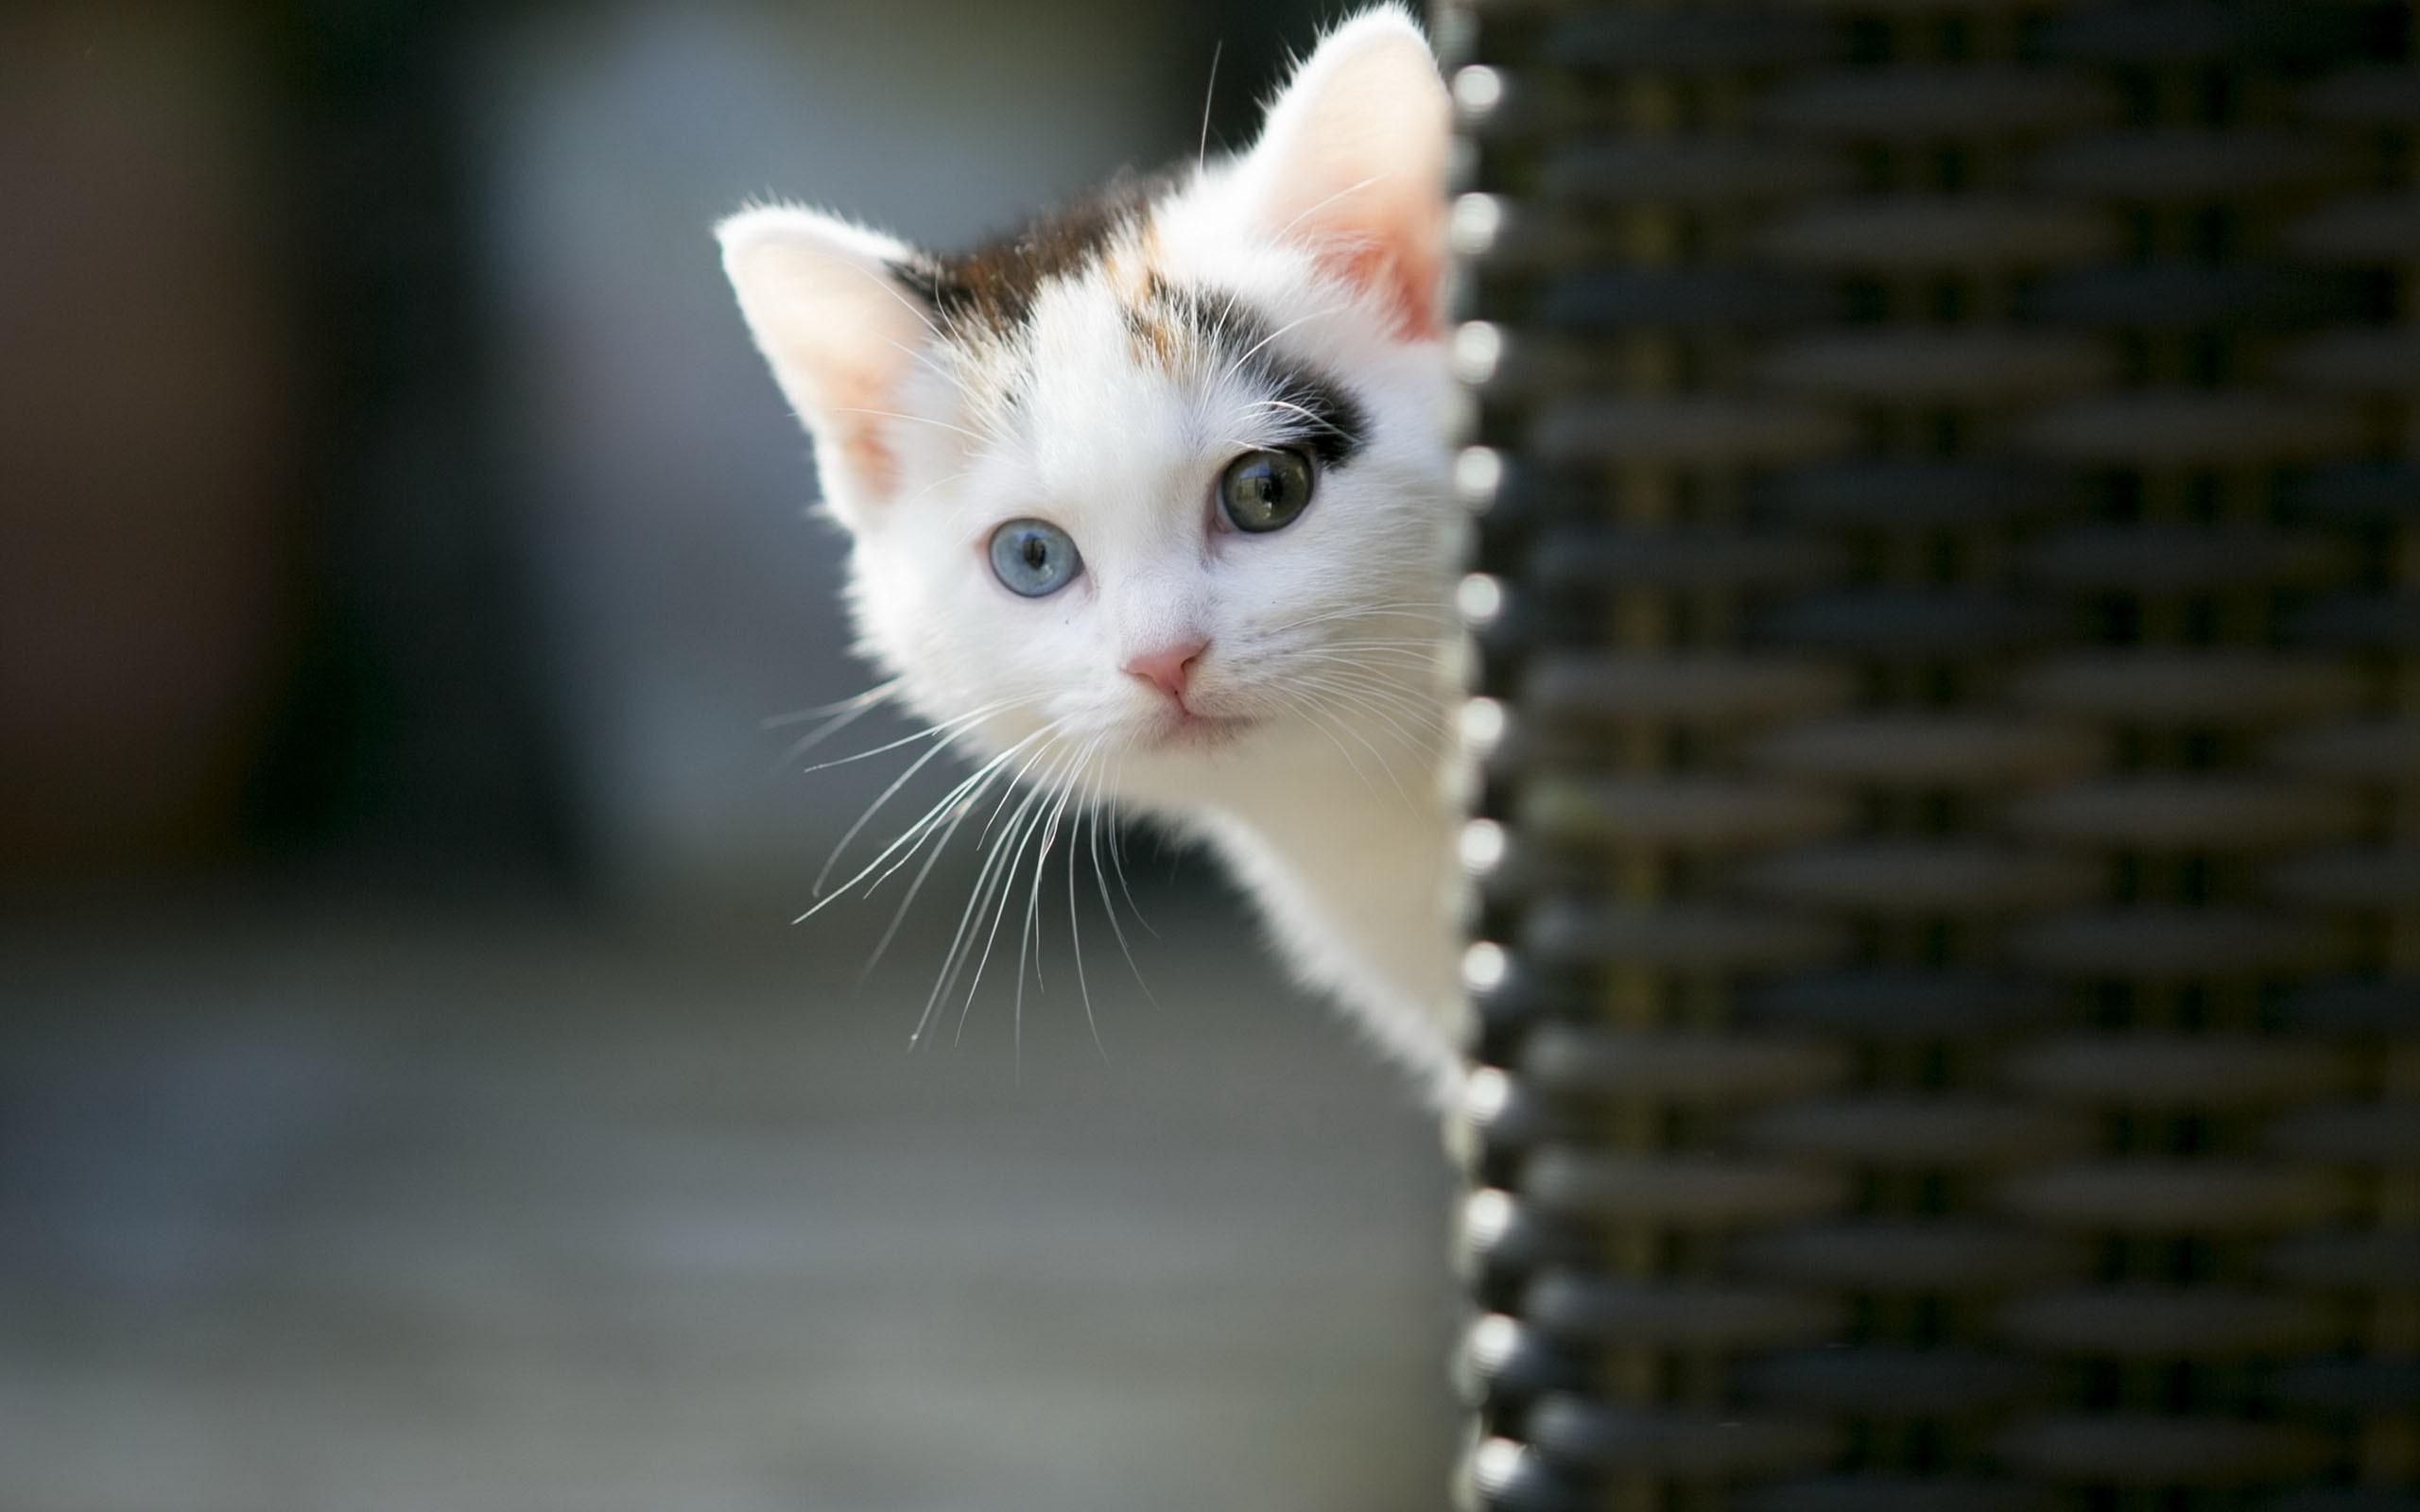 Cute animal wallpapers for desktop 54 images - Cute kittens hd wallpaper free download ...